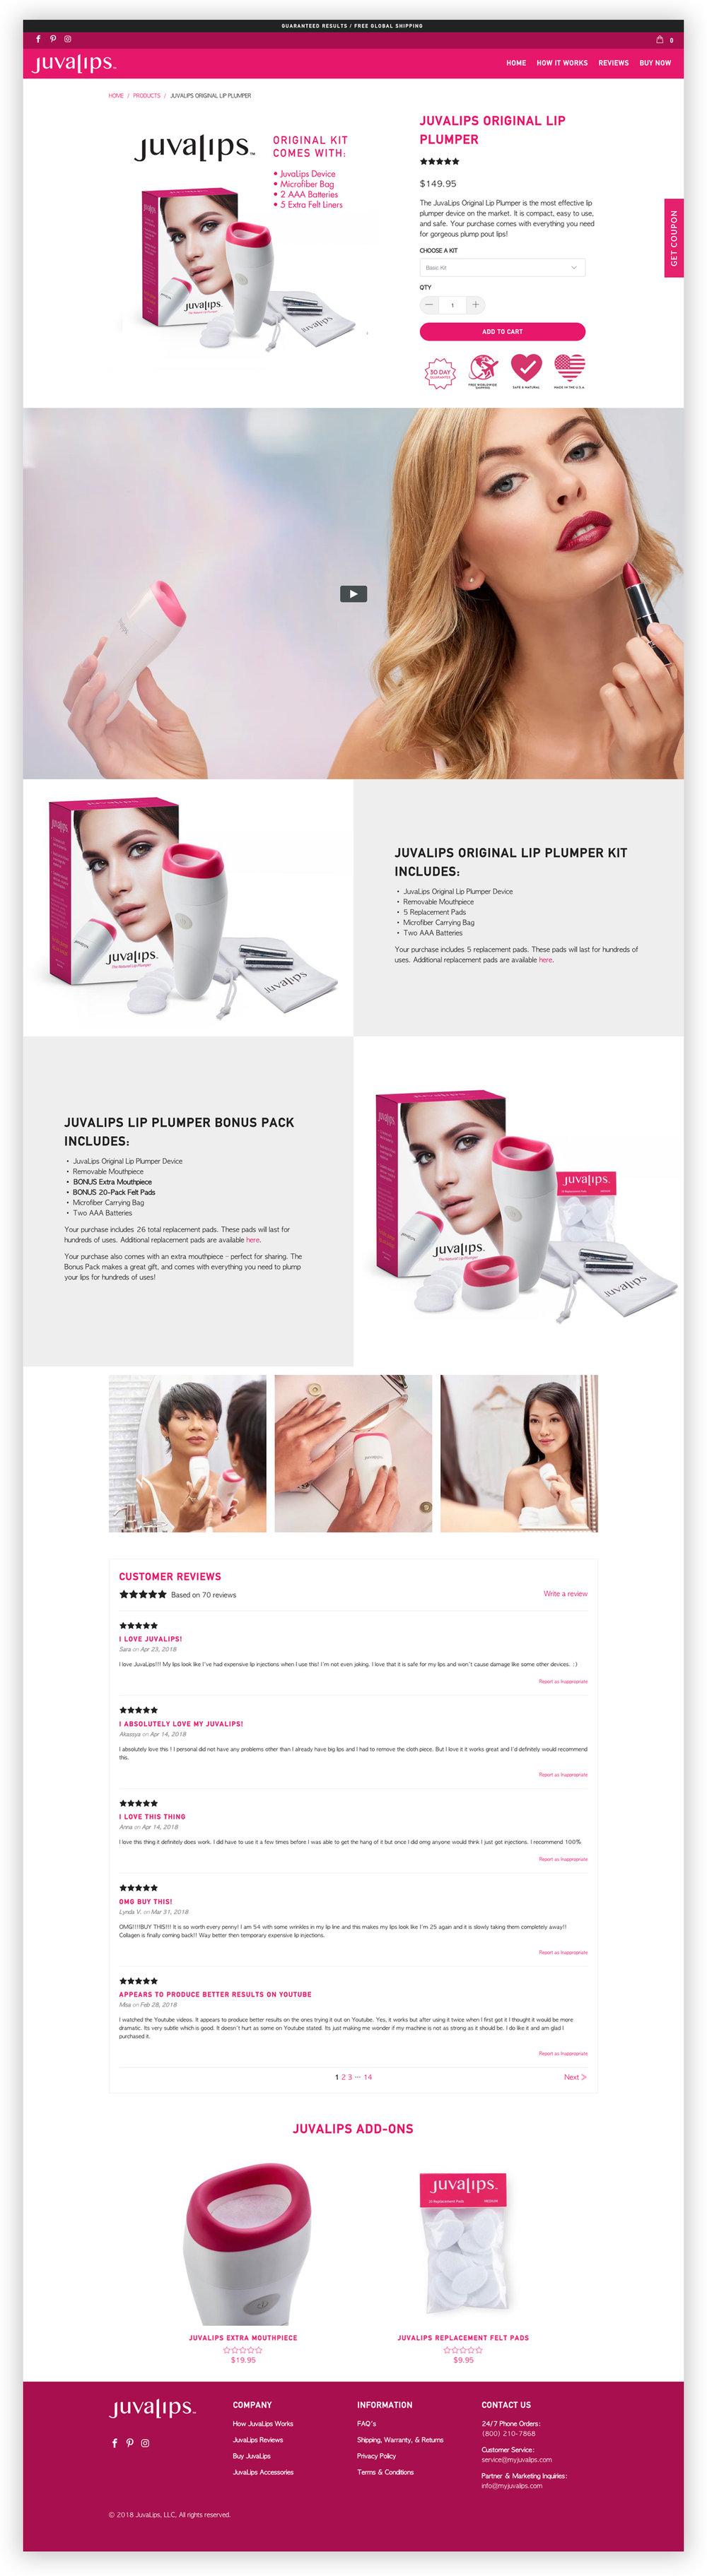 juvalips-product-page-ben-rummel.jpg